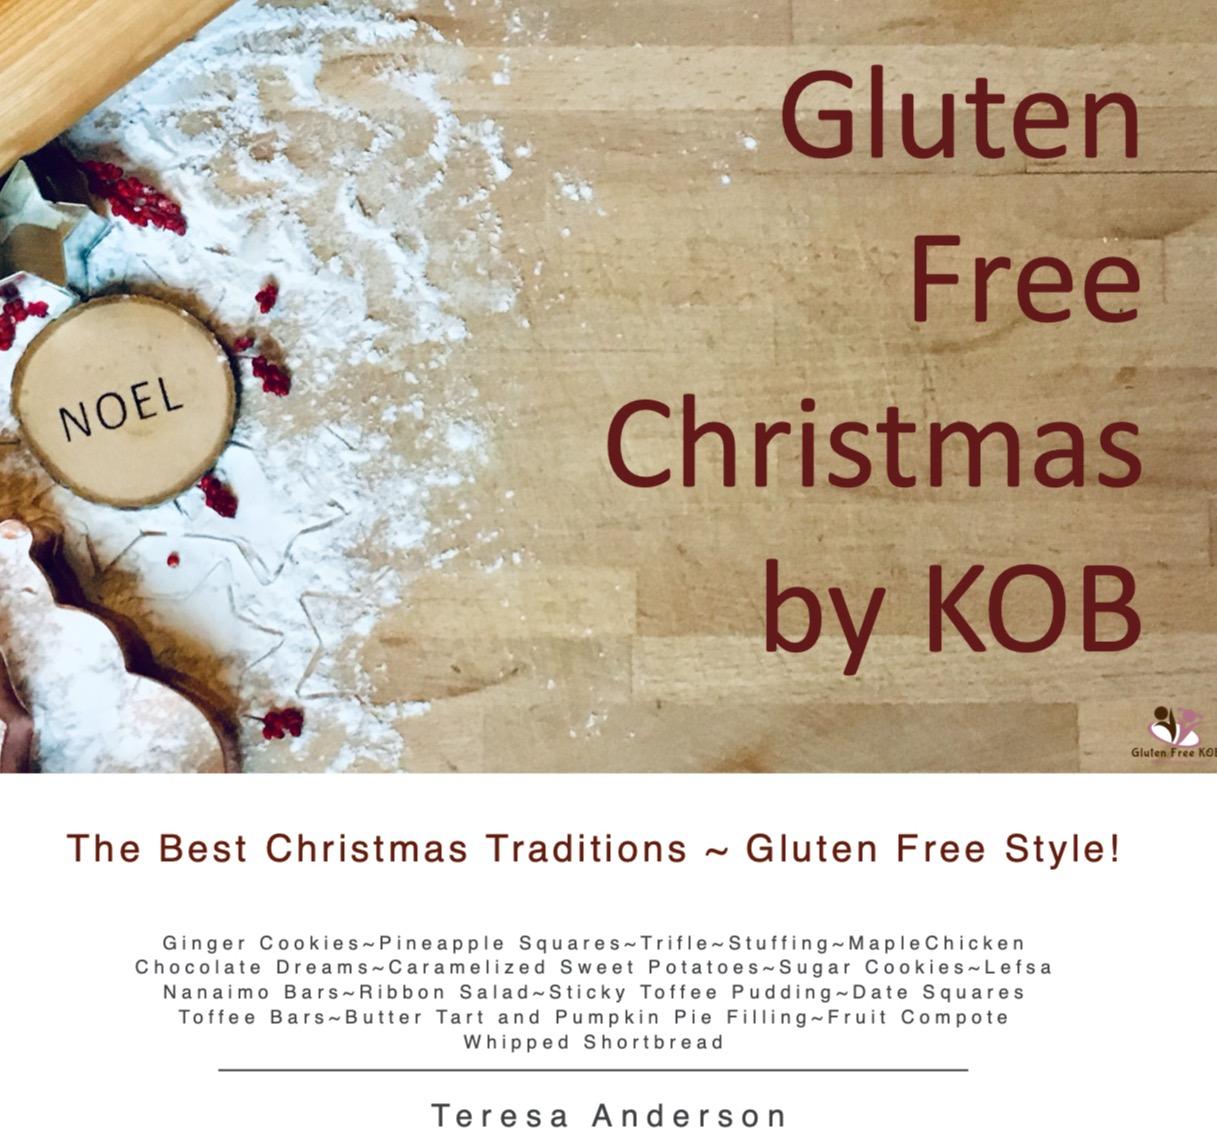 Gluten Free Christmas ebook